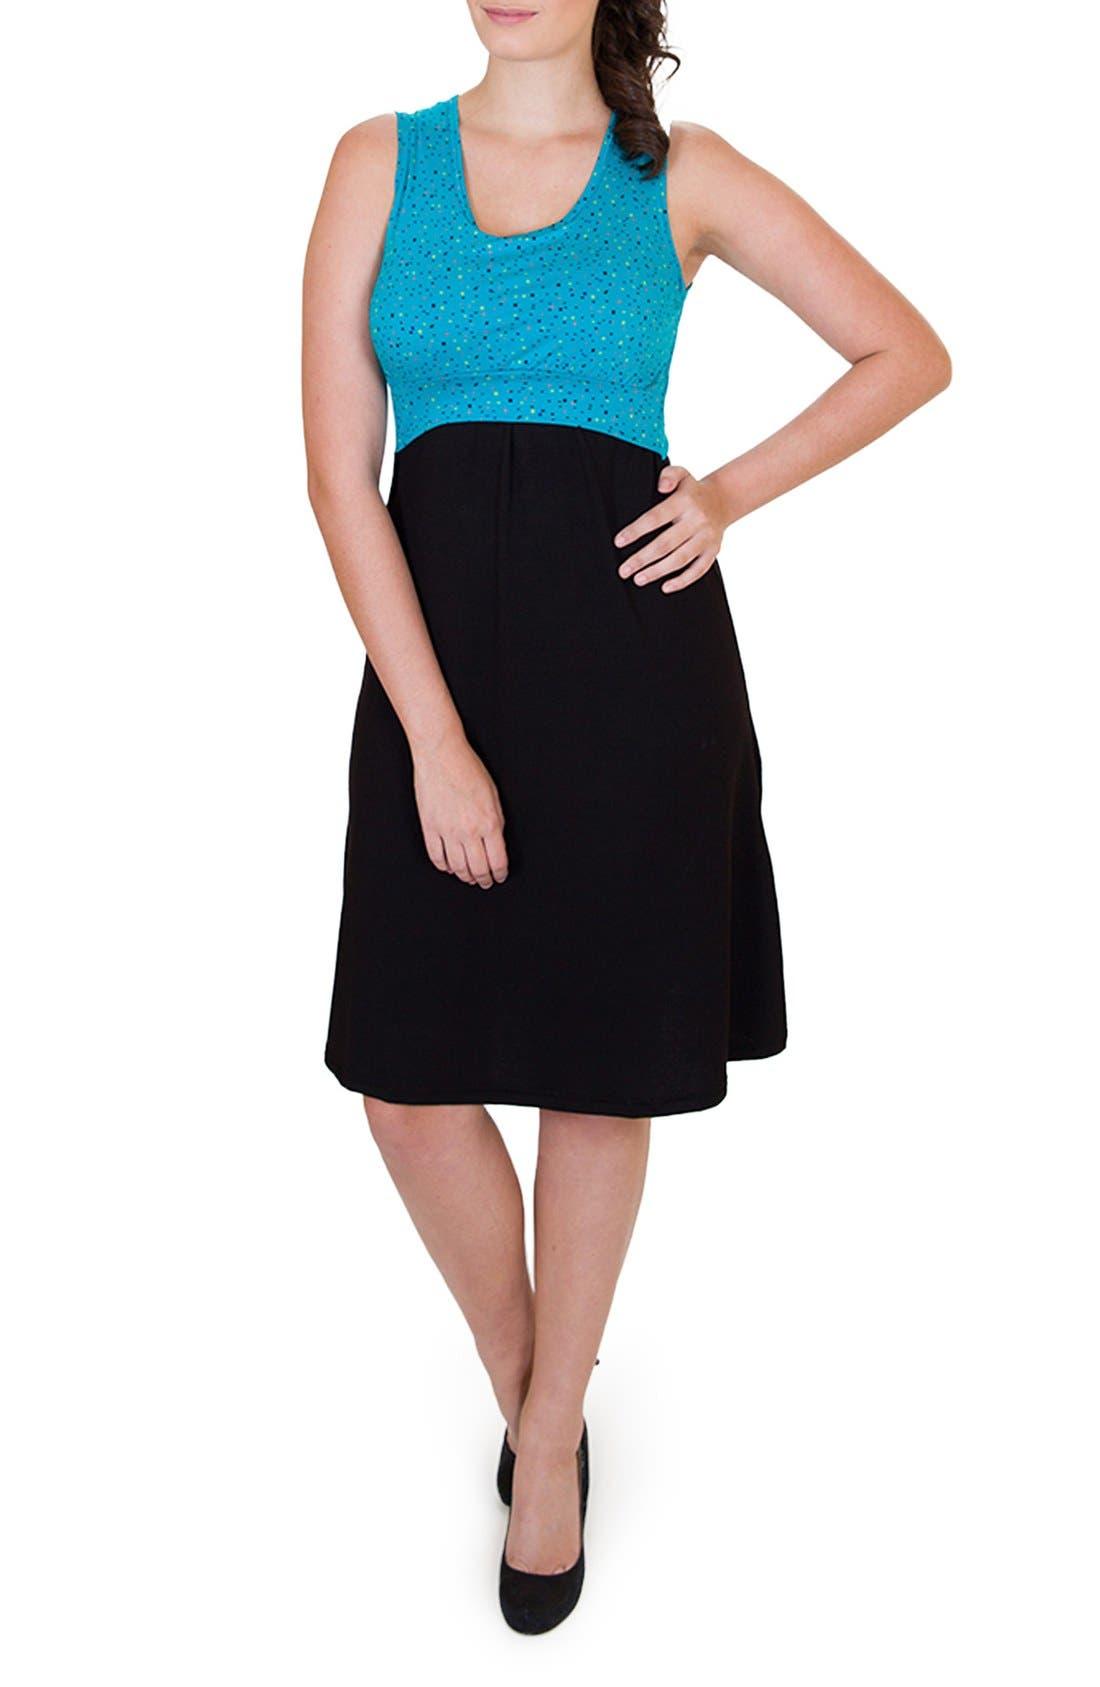 'Ana' Maternity/Nursing Dress,                             Main thumbnail 1, color,                             DOTS TOP W/ BLACK SKIRT